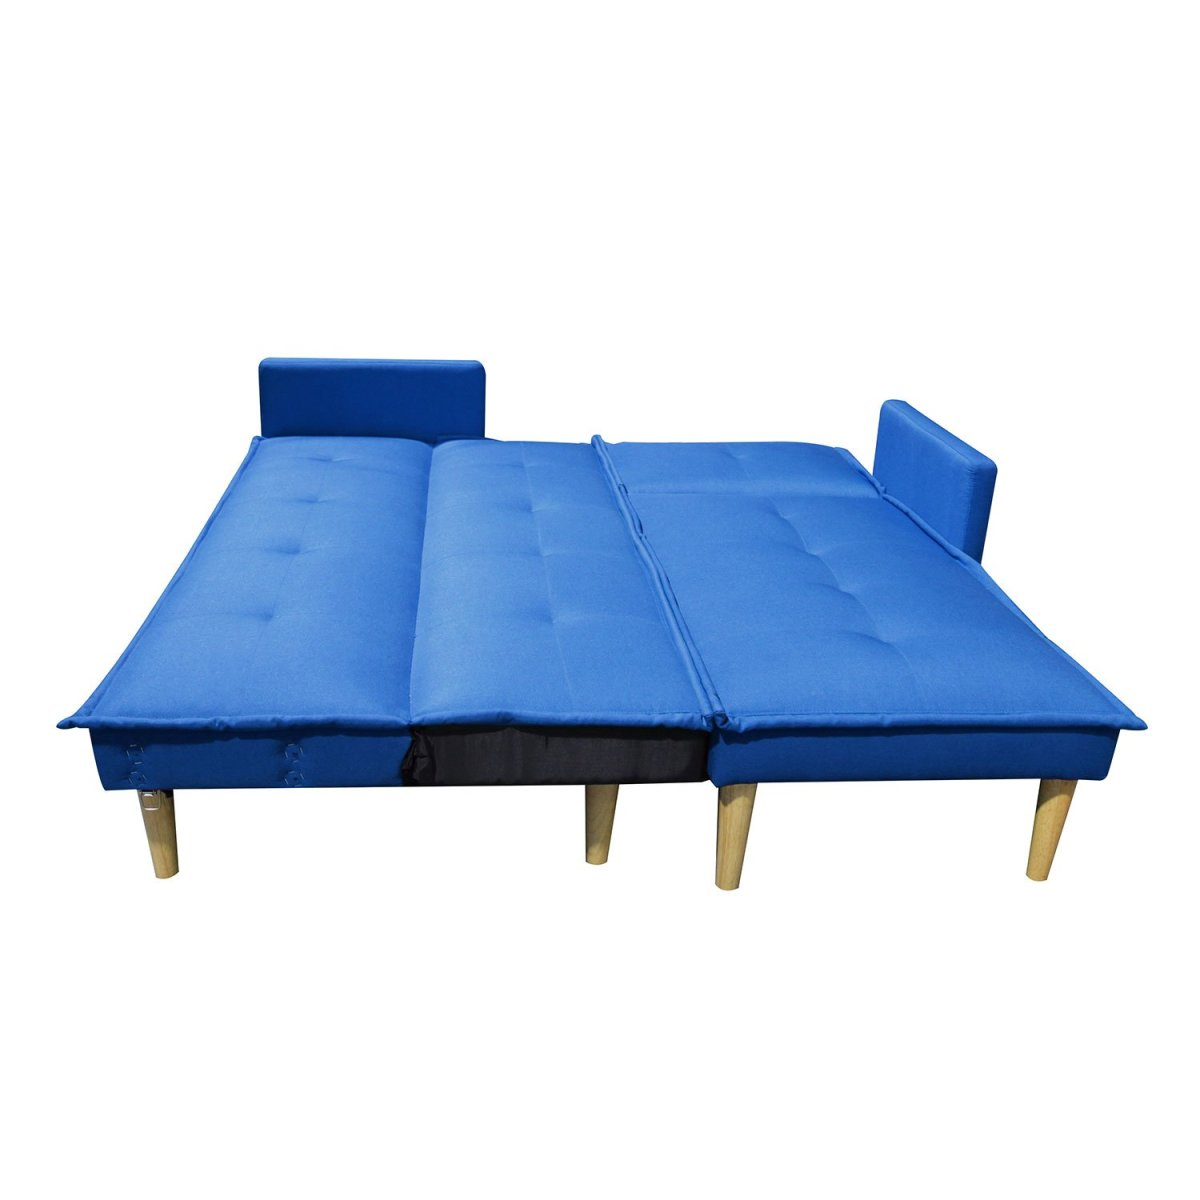 sala esquinada sofá cama independencia azul 7